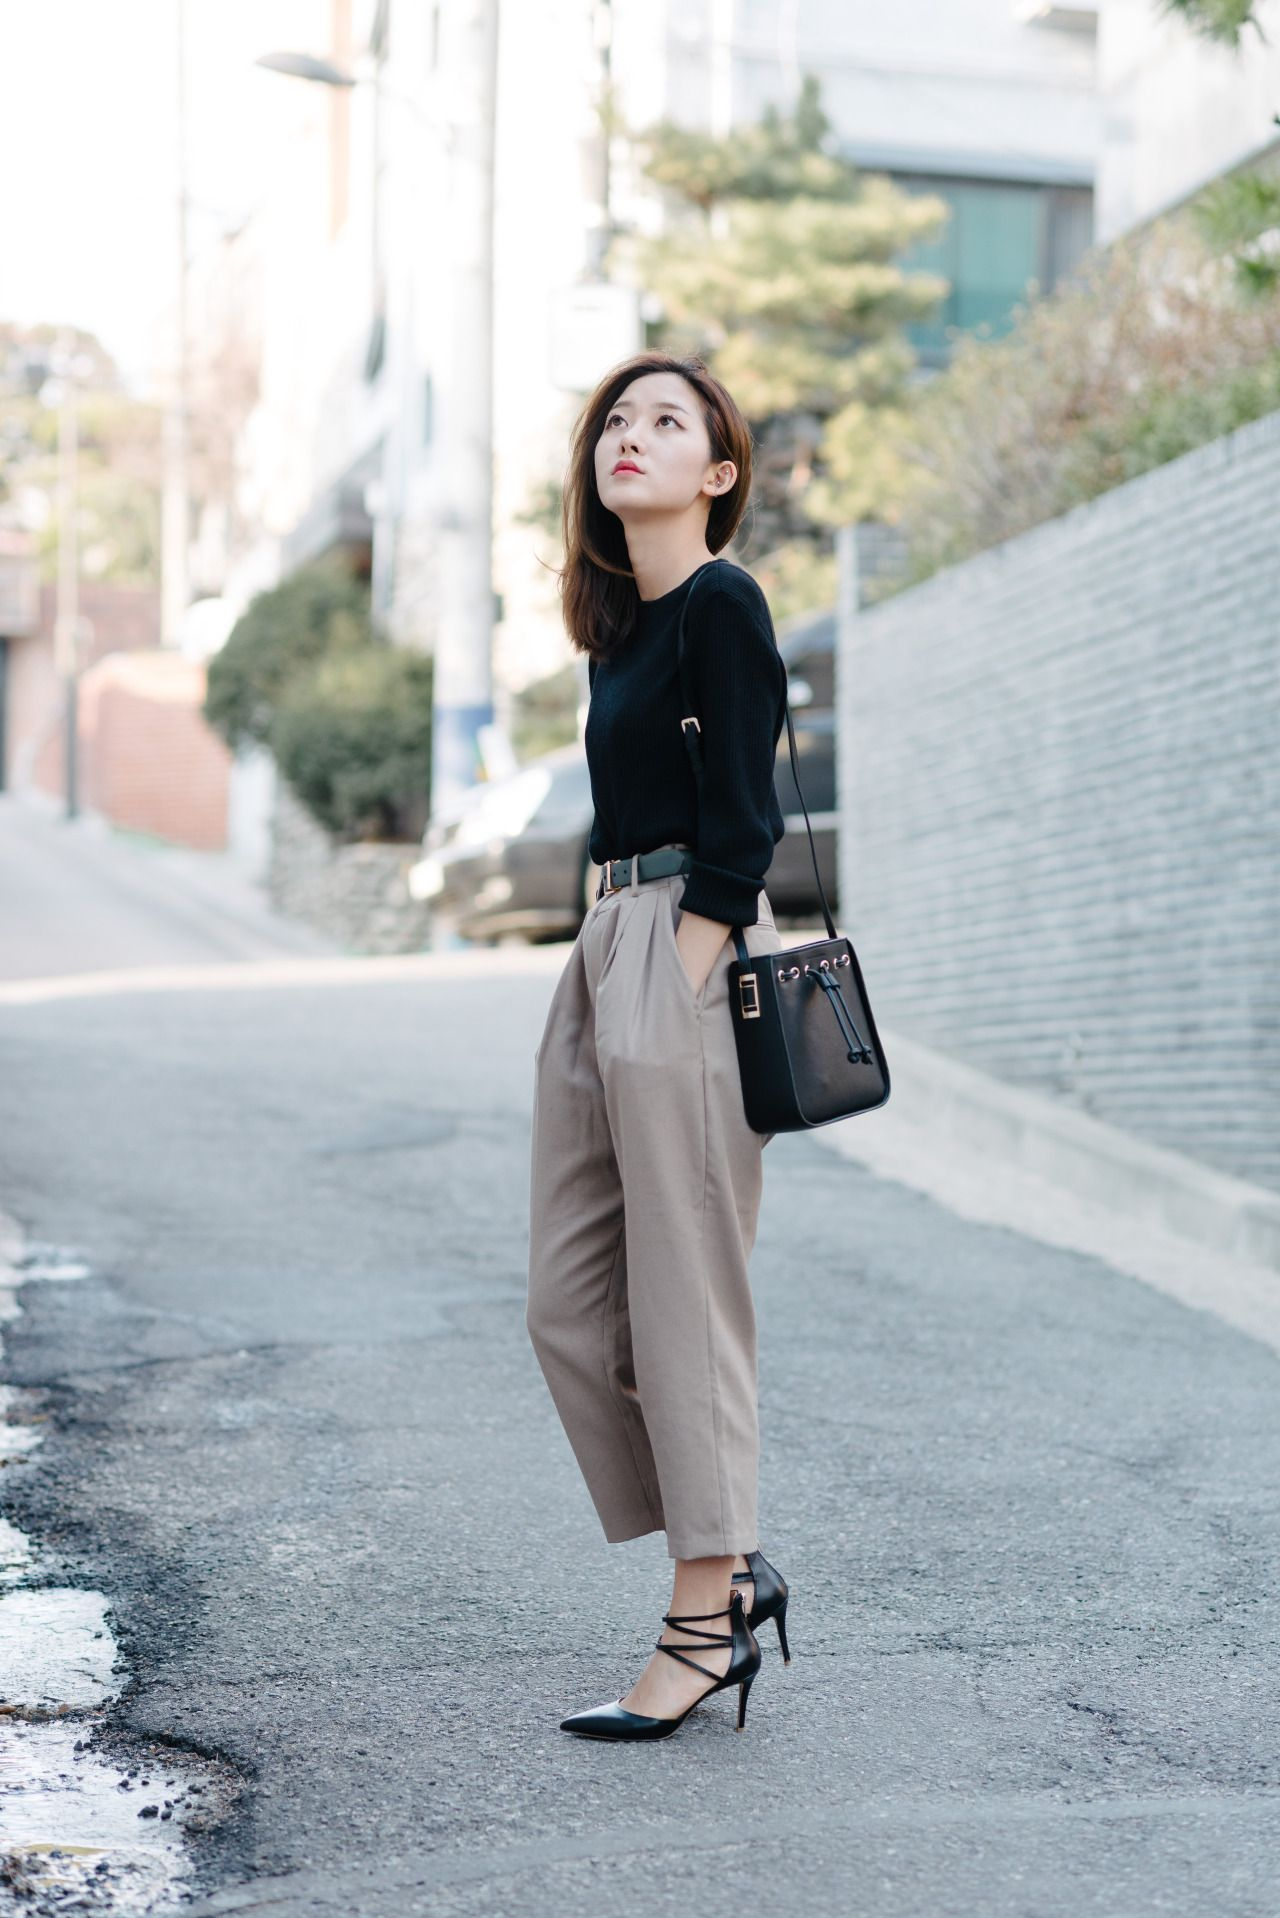 #koreanmodel for WWW.IAMALEXFINCH.COM | Her wardrobe ...